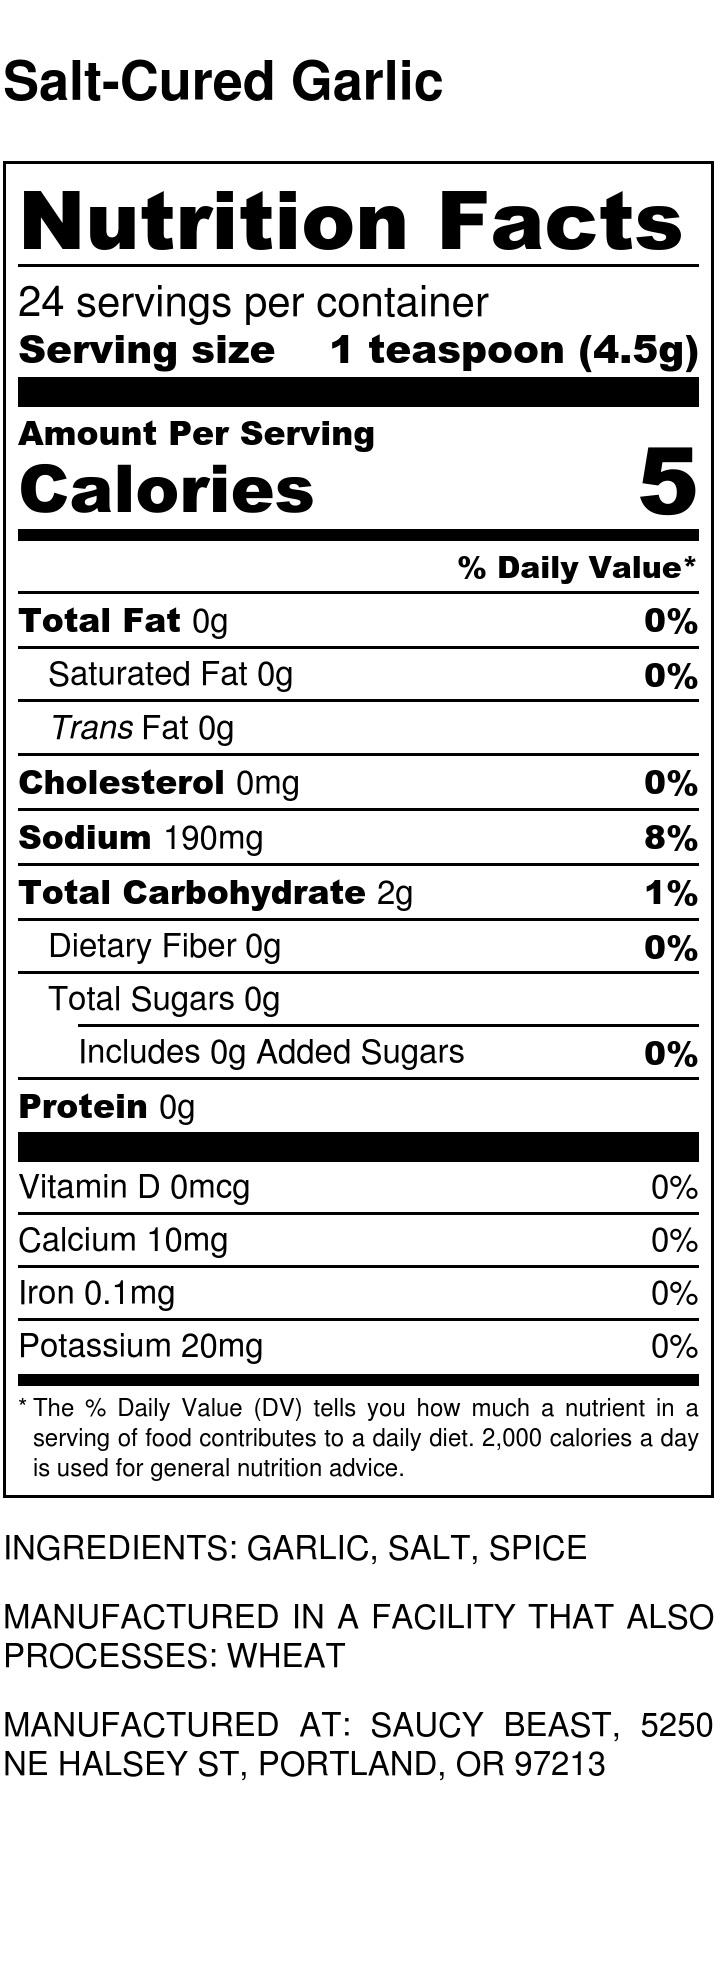 Salt Cured Garlic label